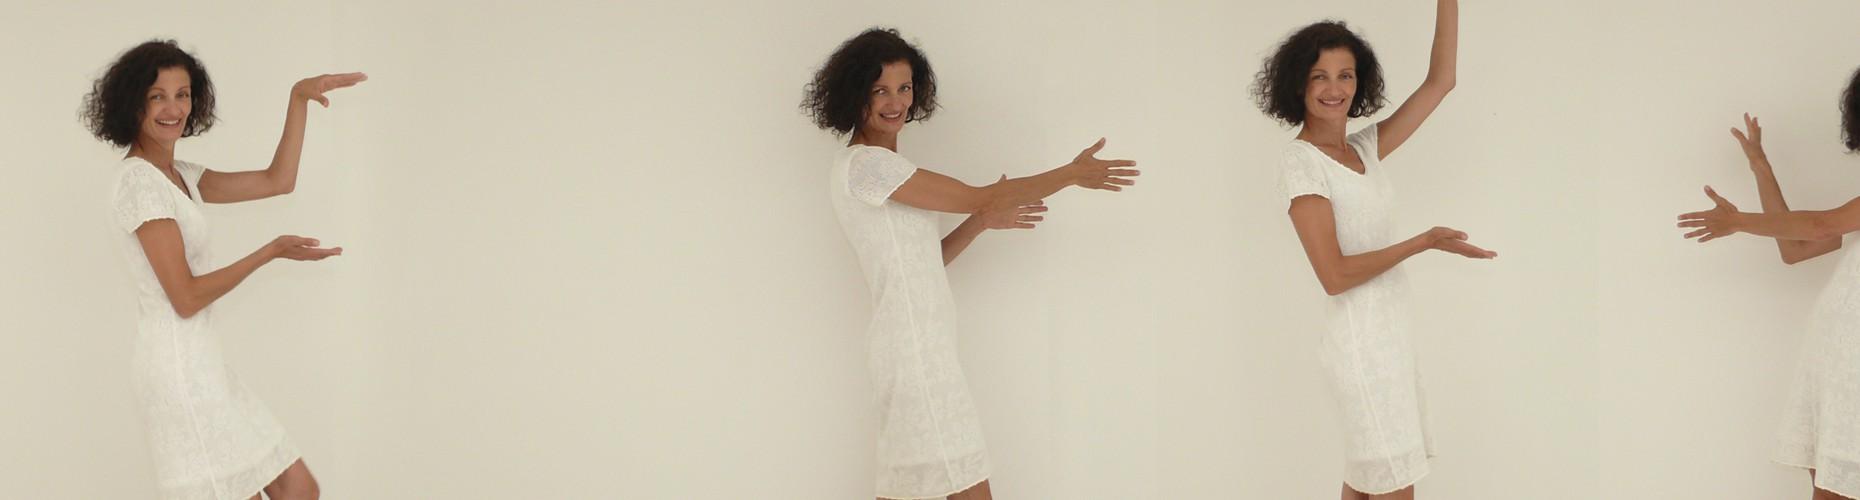 Andrea Casapicola Consulting & Coaching